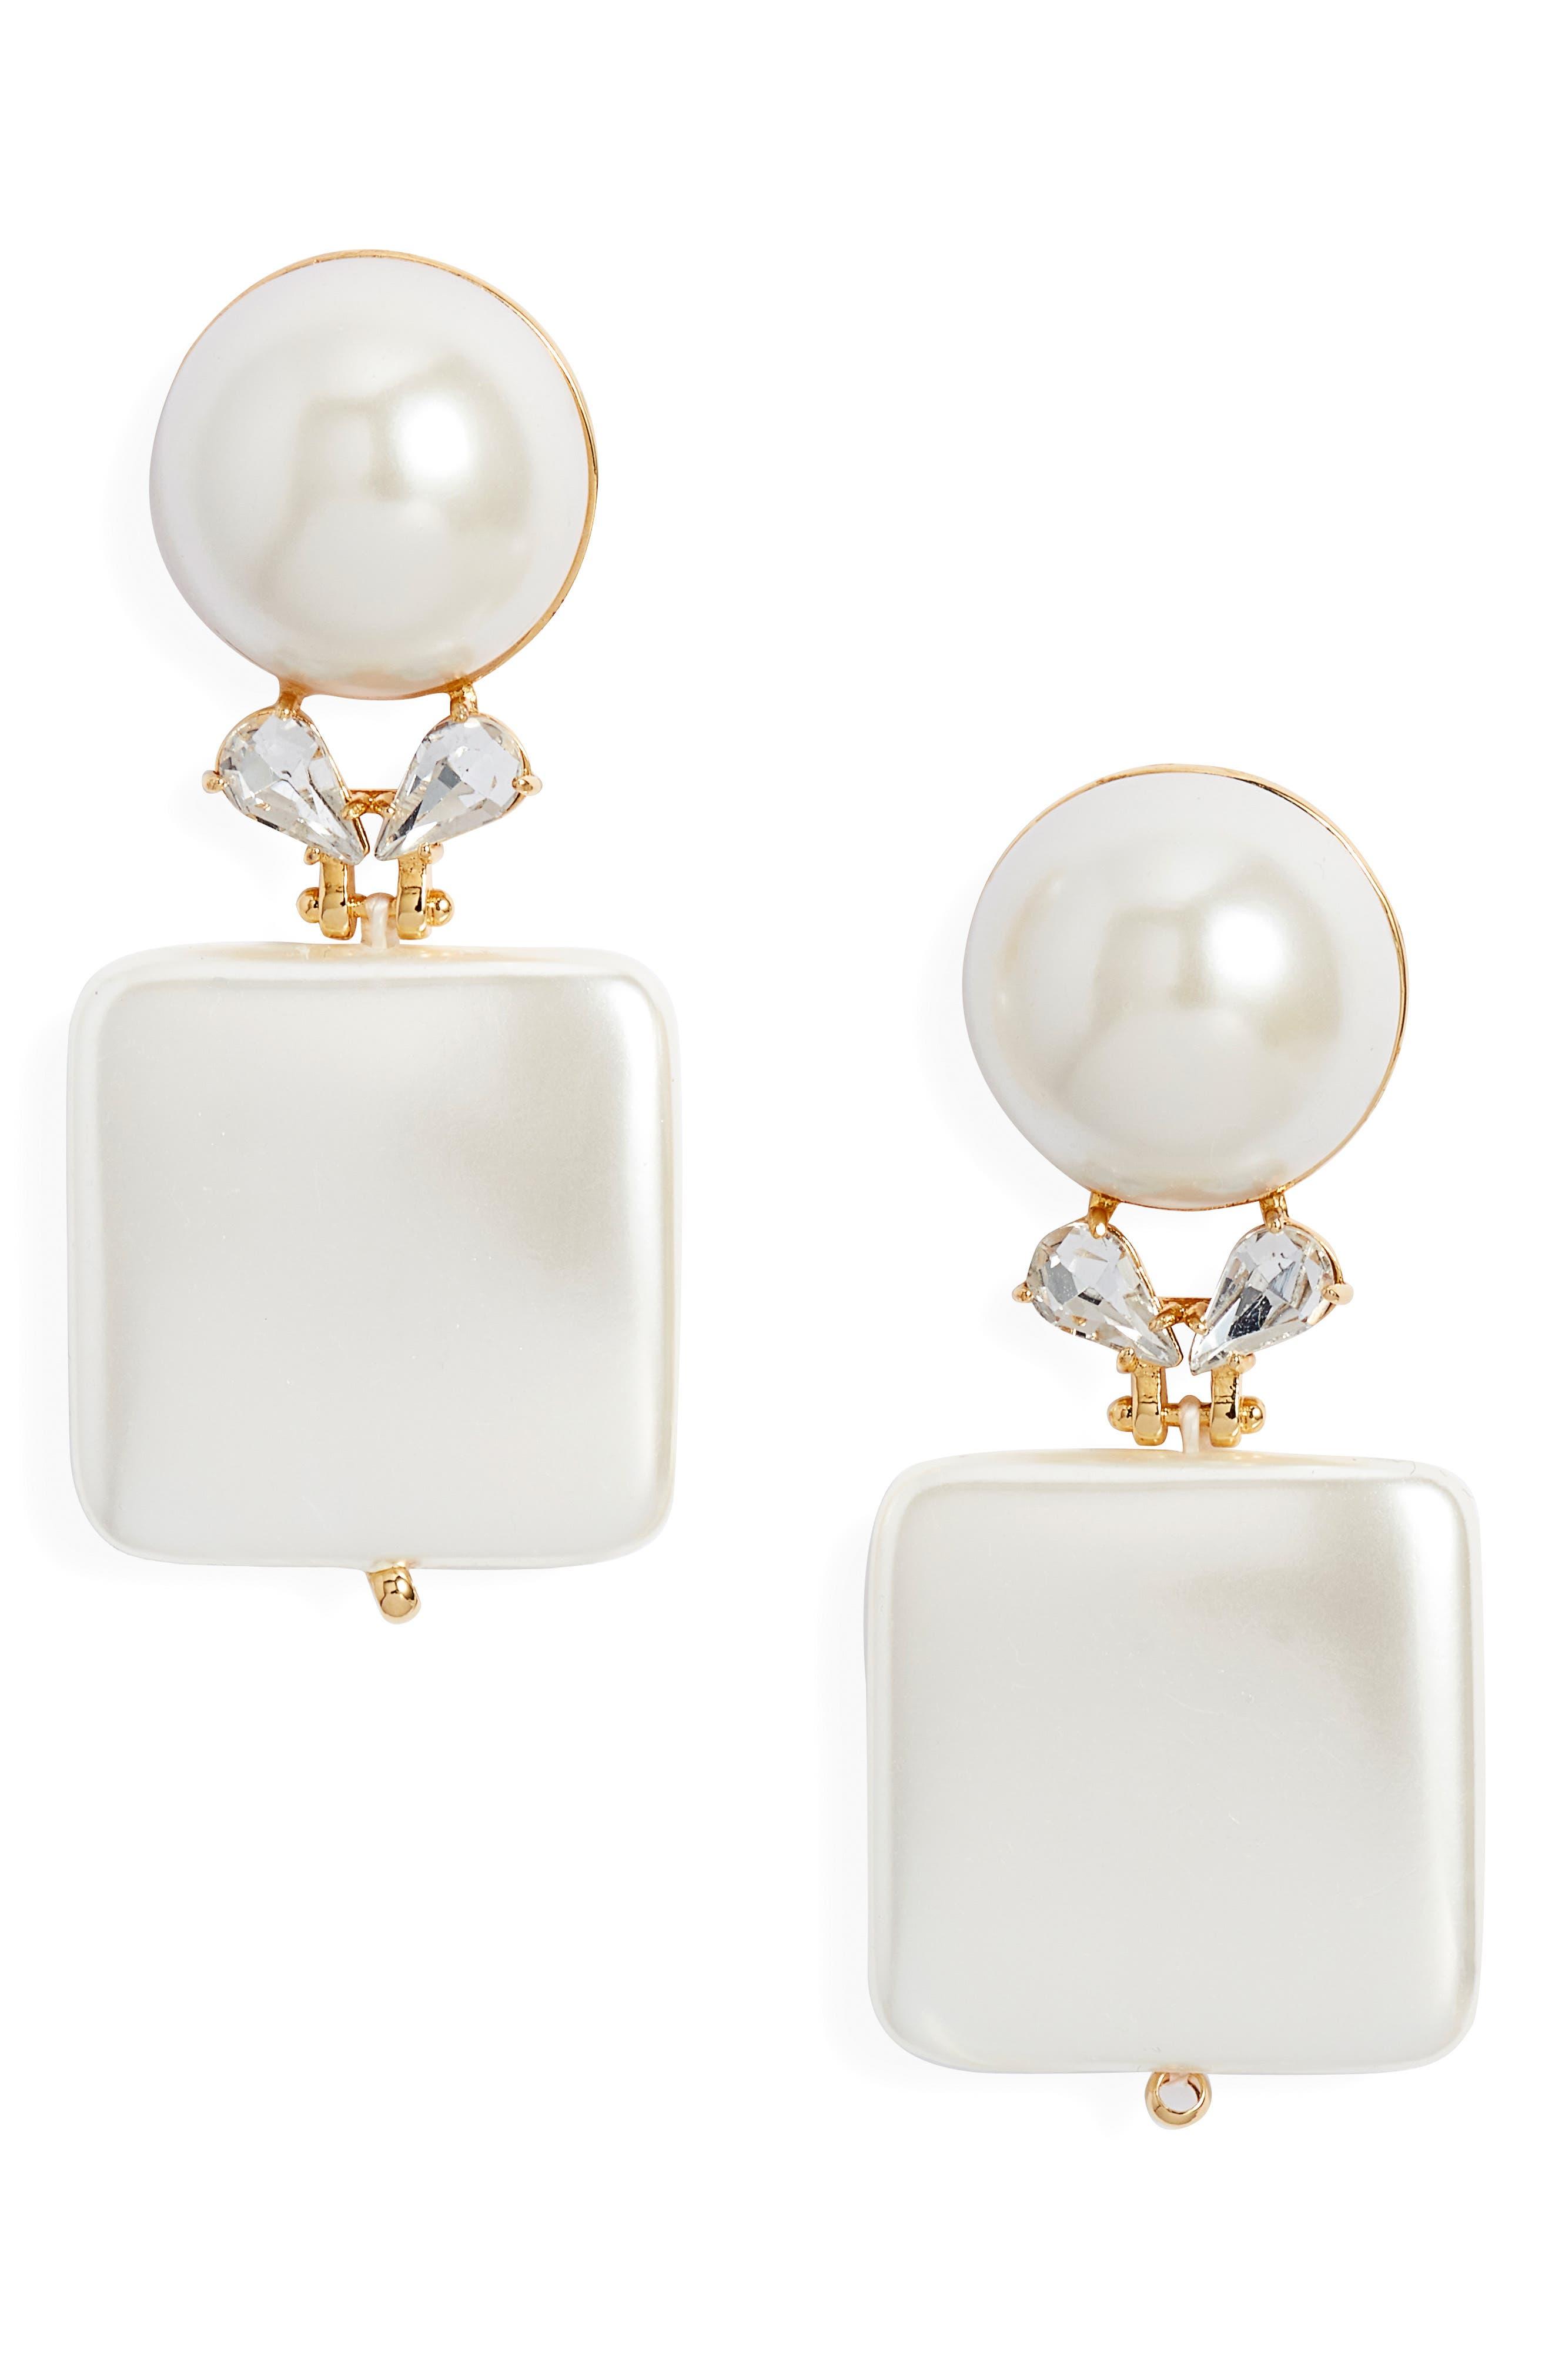 LELE SADOUGHI Starlet Stone Drop Earrings in Pearl